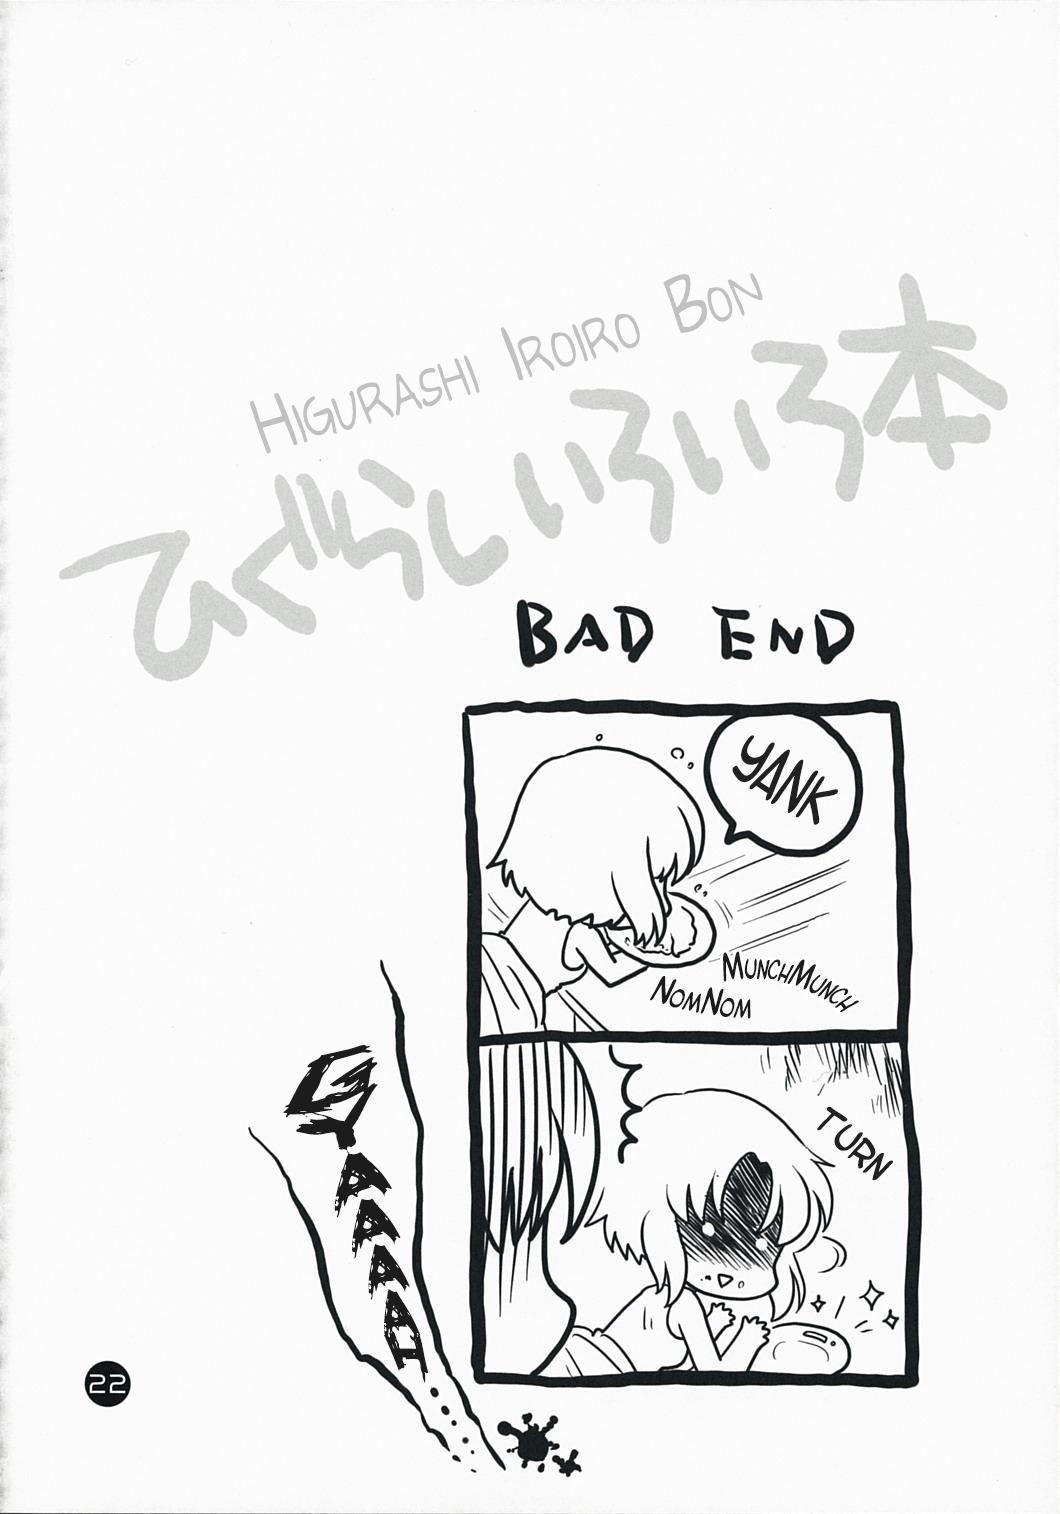 Higurashi Iroiro Bon 20